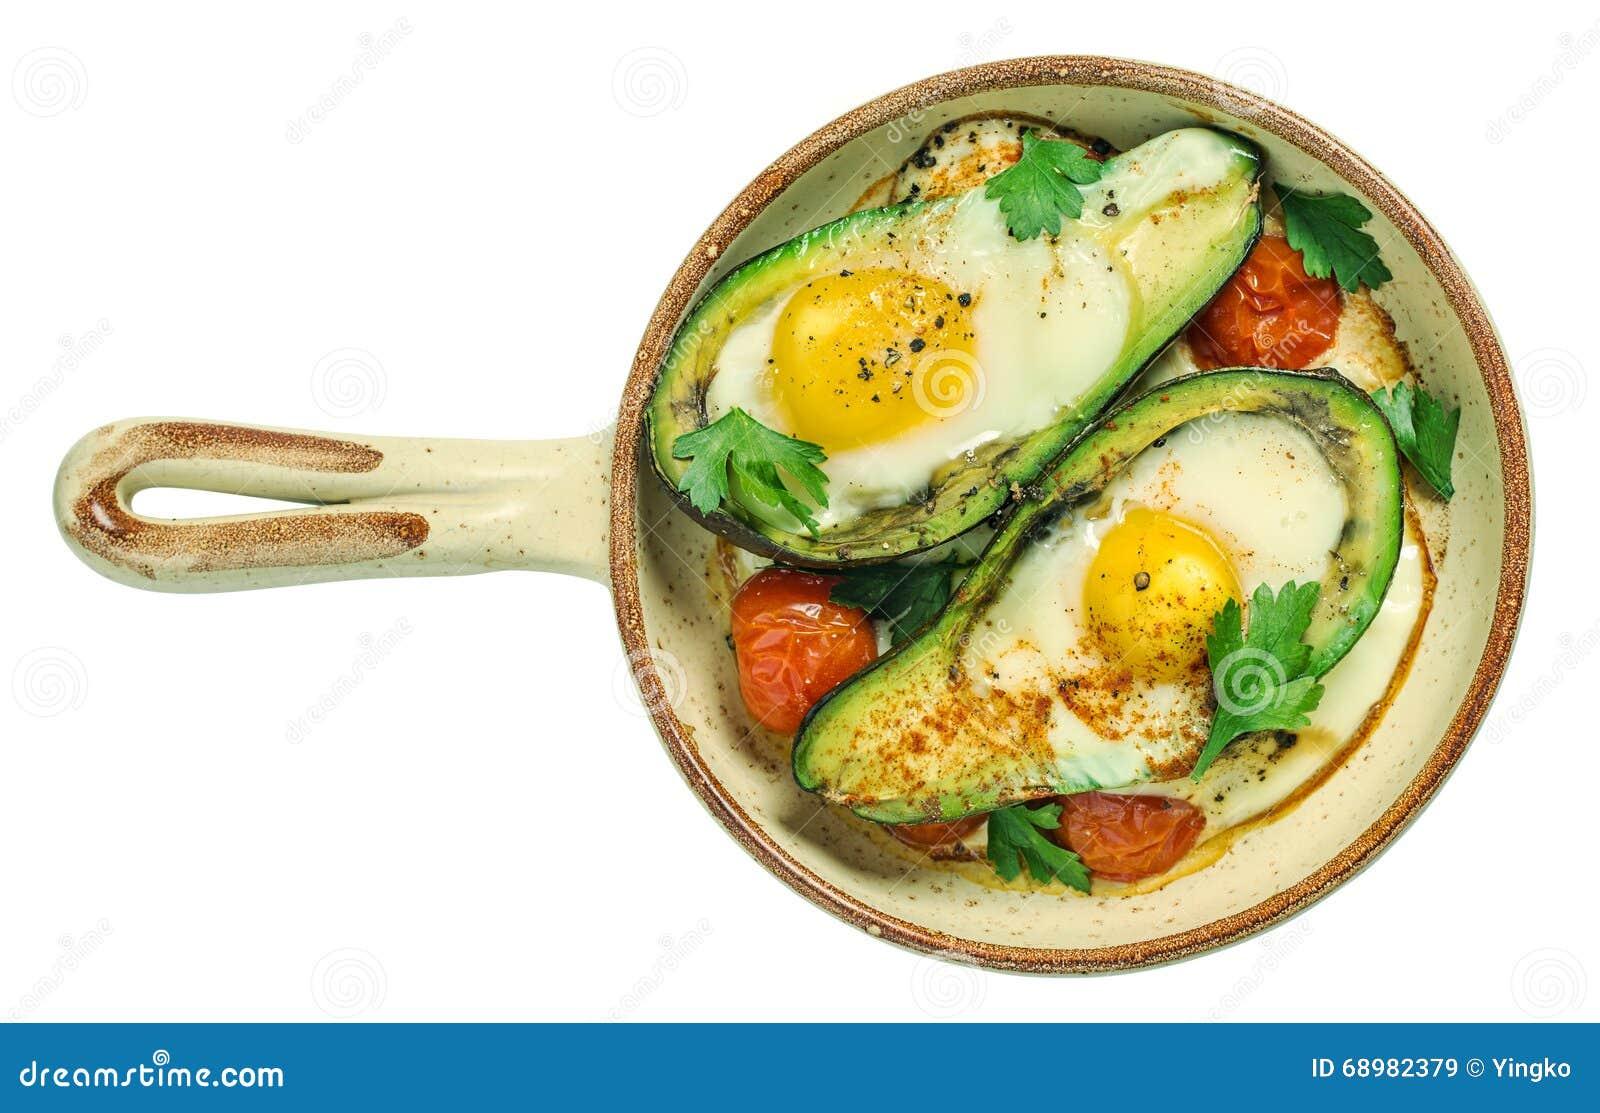 Abacate cozido com ovo